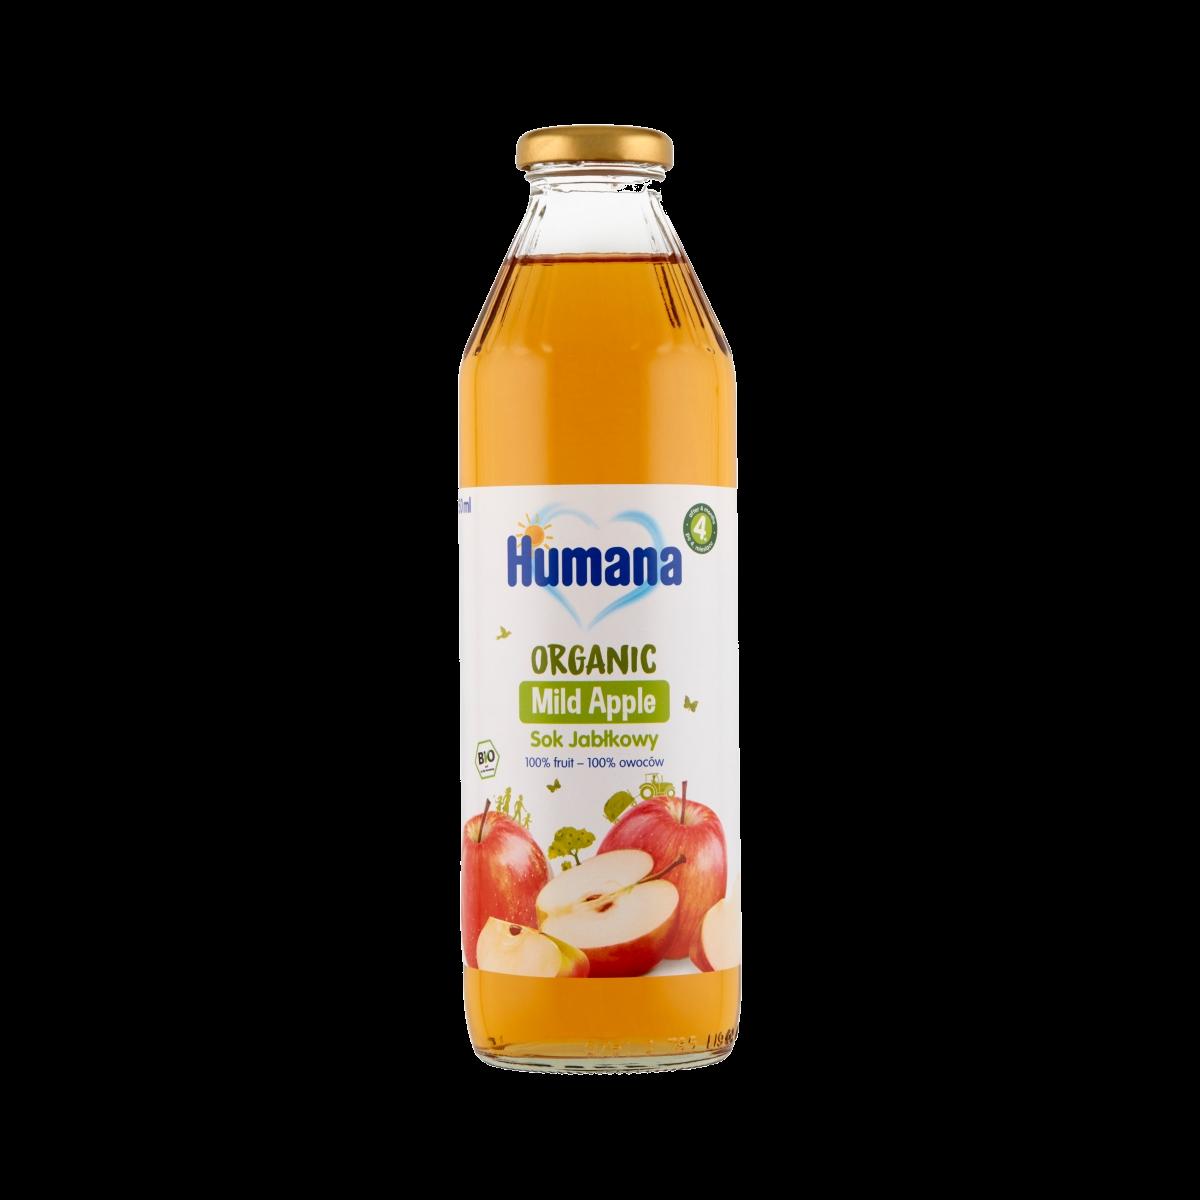 humana_sok_jablko